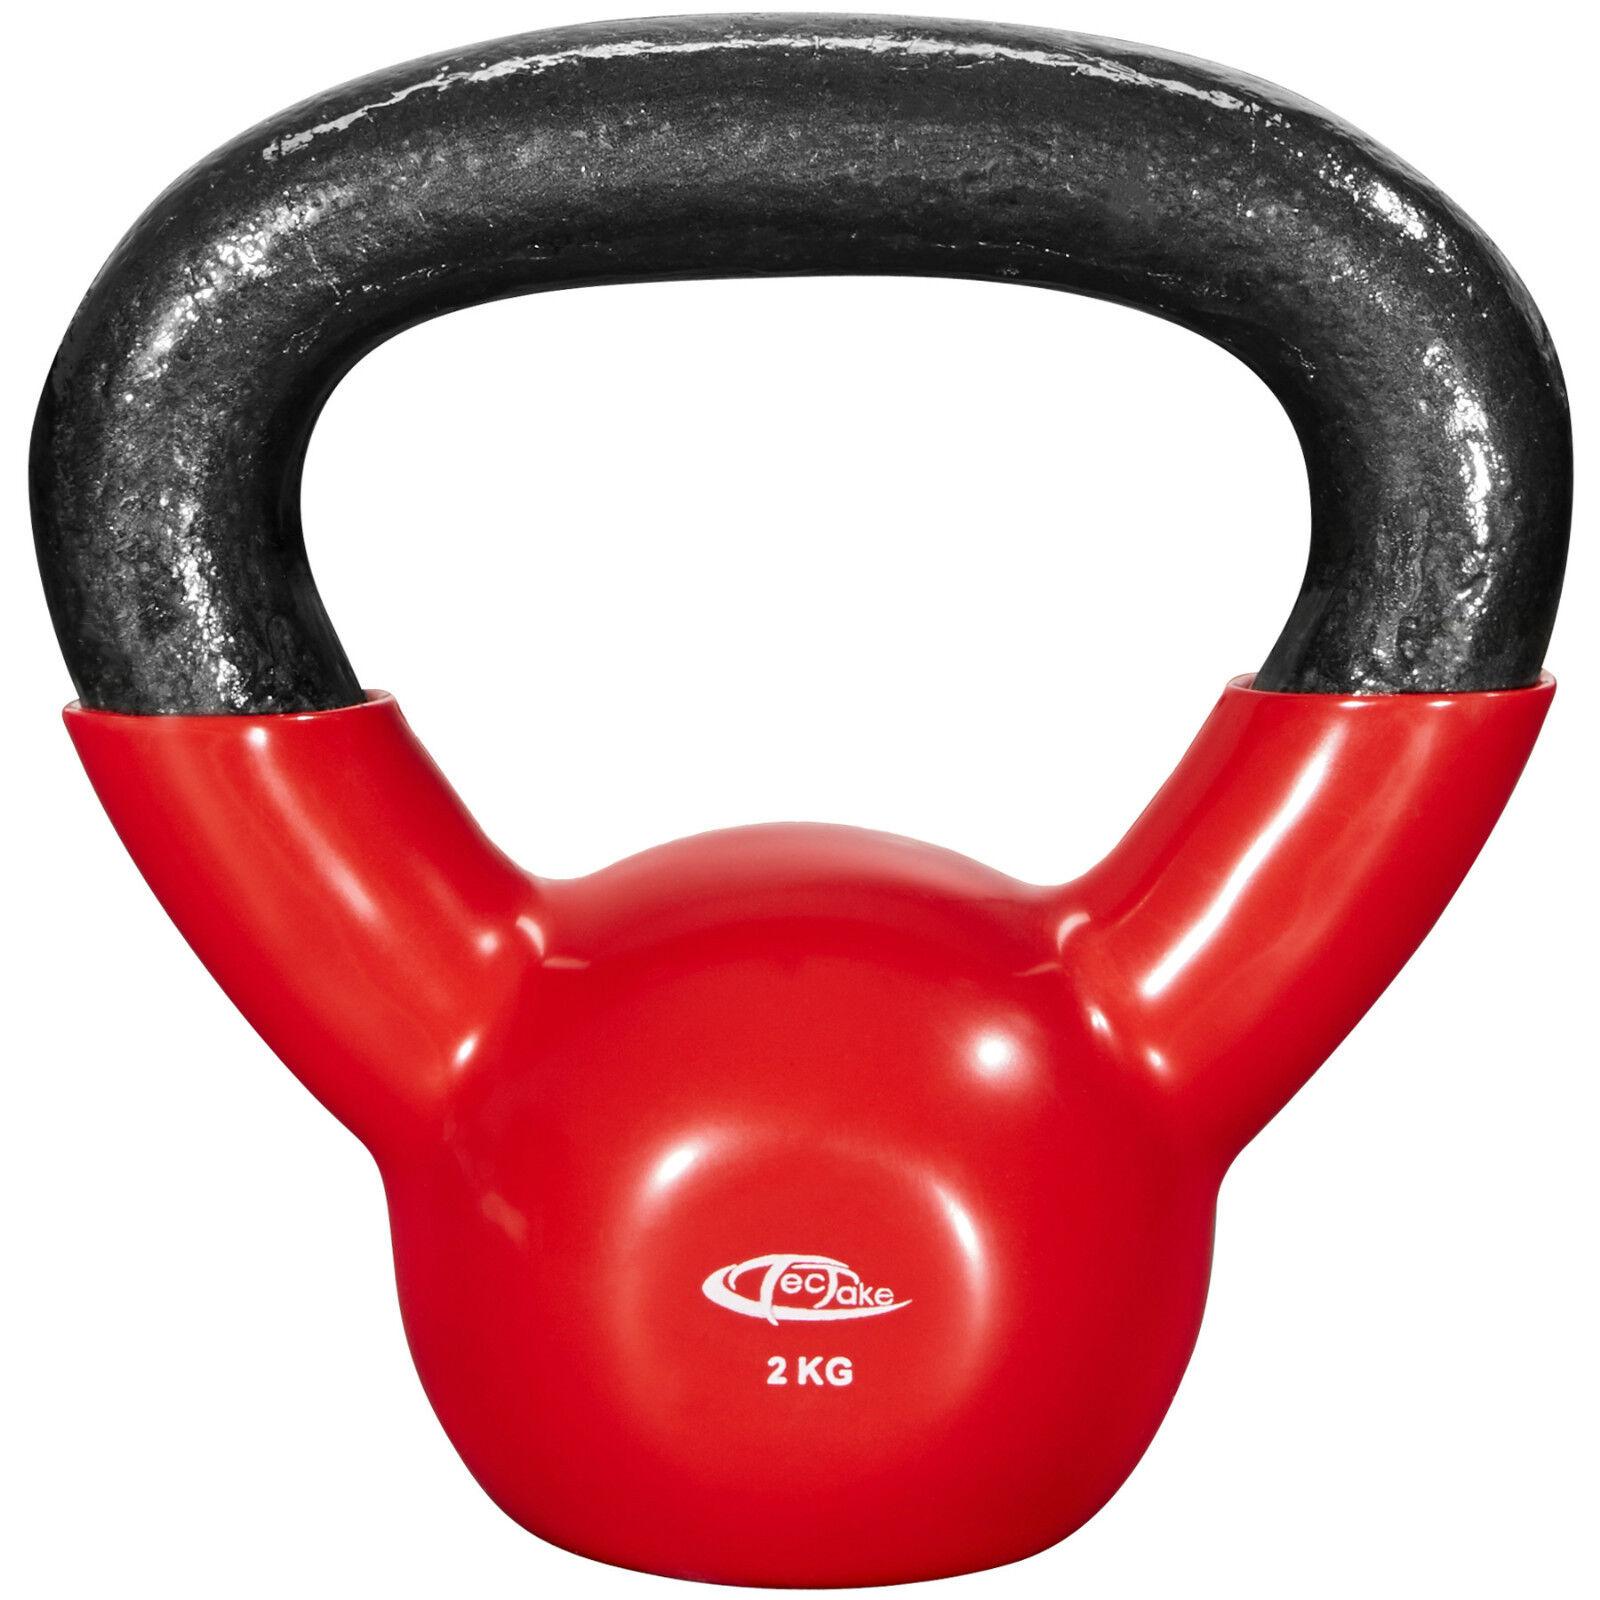 Cast Iron Kettlebell 2kg to 24kg home venyl strength training home 24kg gym fitness 3c715b